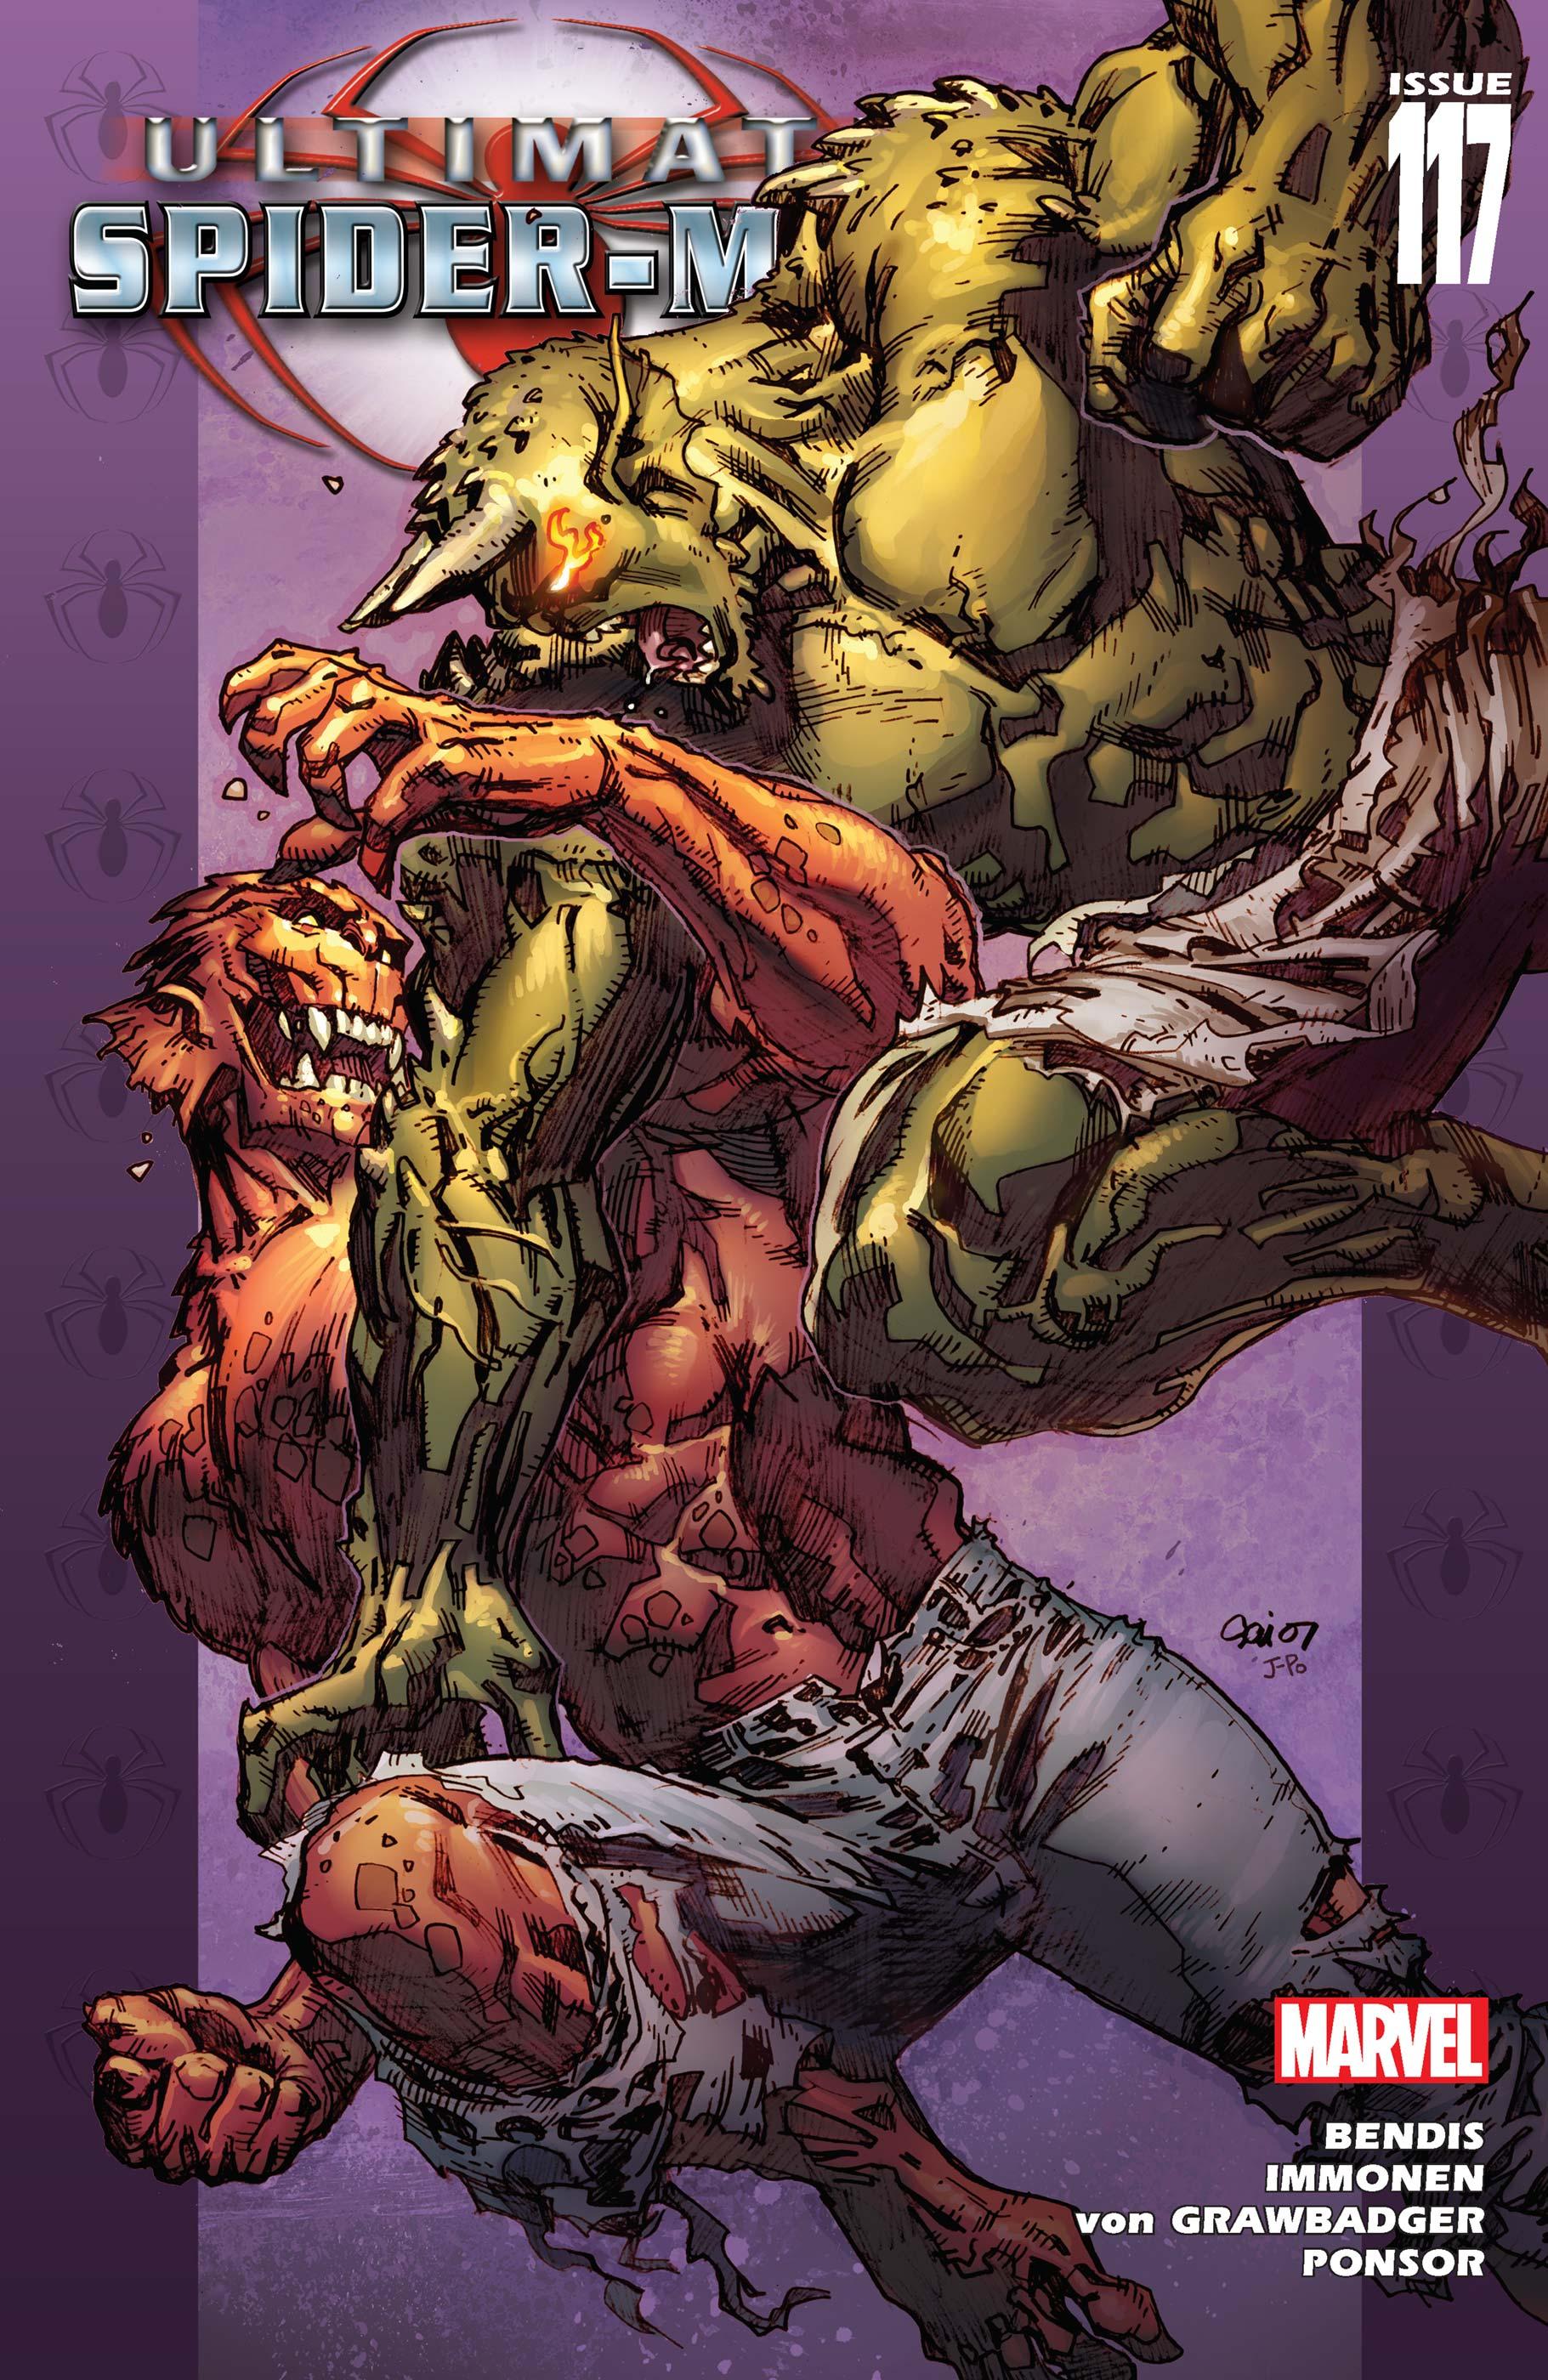 Ultimate Spider-Man (2000) #117